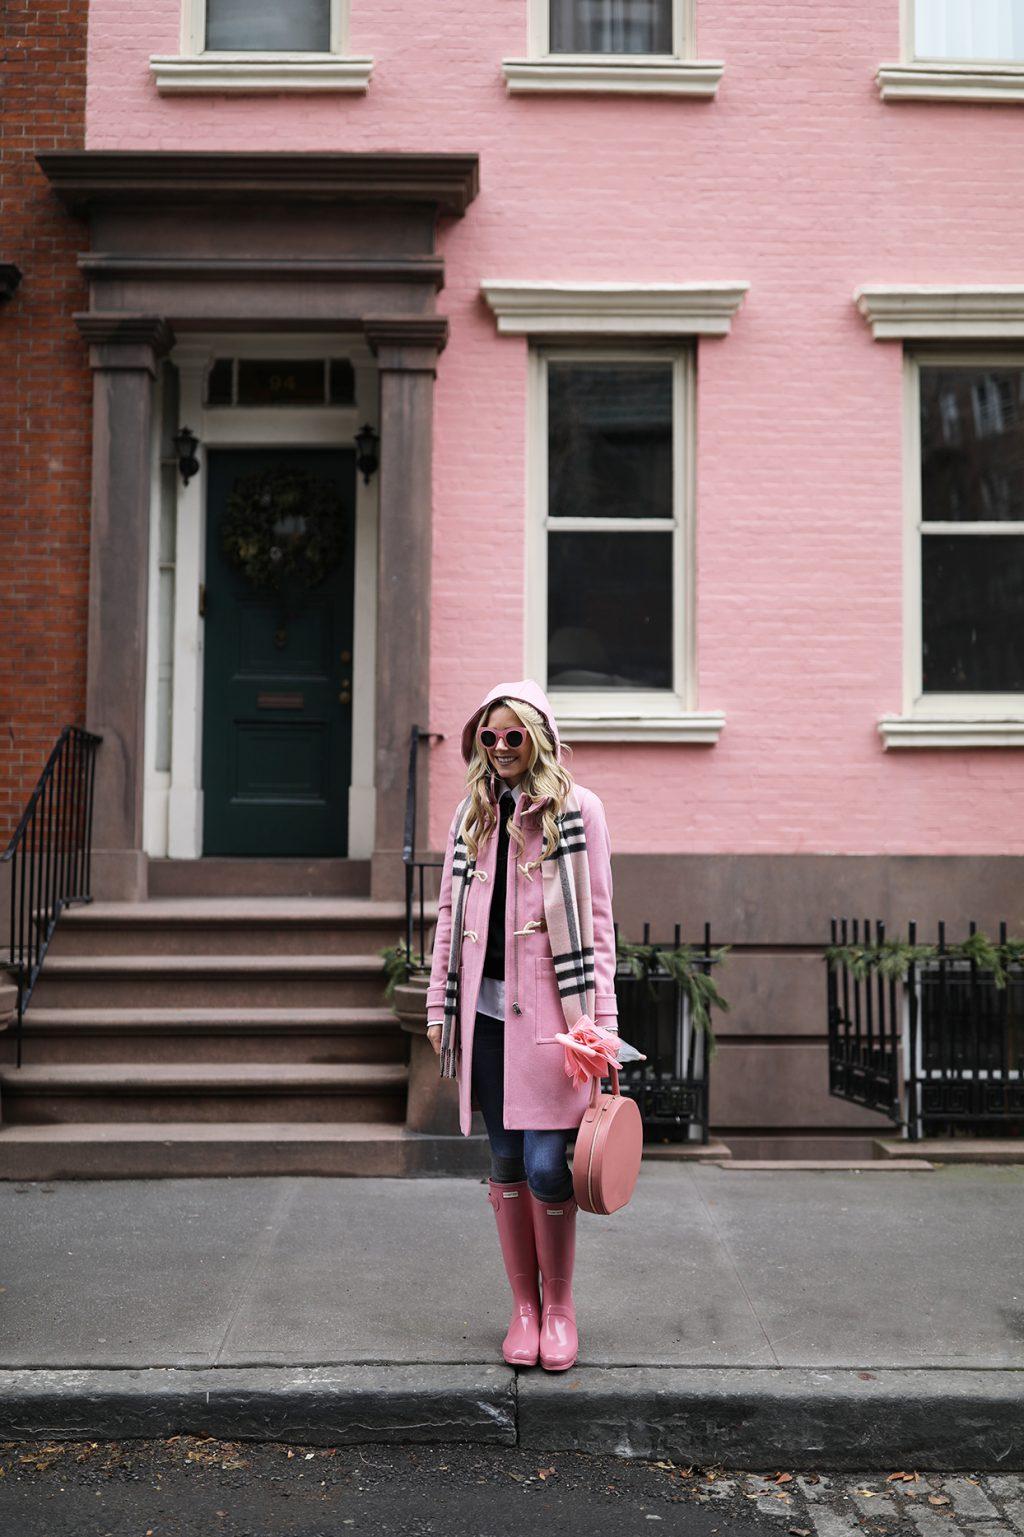 blair-eadie-atlantic-pacific-blogger-ny-fashion-jcrew-pink-toggle-coat-hunter